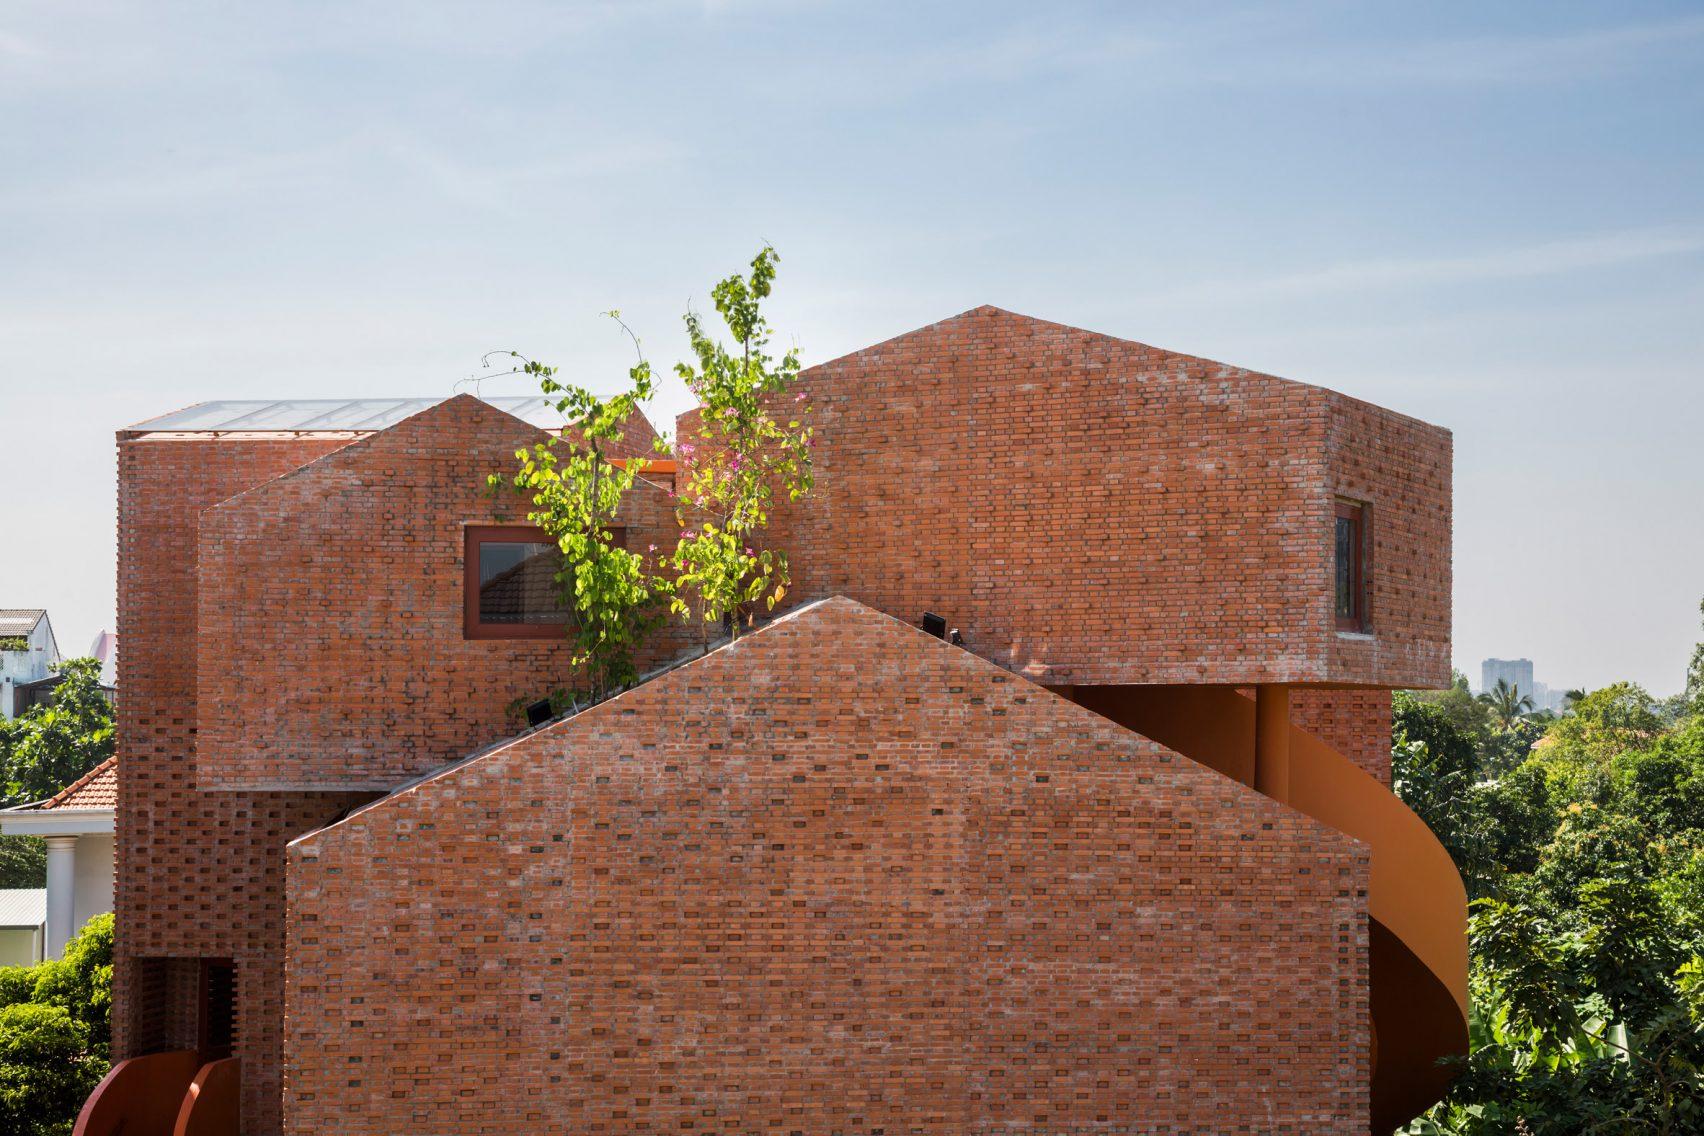 chuon-chuon-kim-kindergarten-kientruc-o-architecture-education-vietnam_dezeen_2364_col_2-1704x1136.jpg